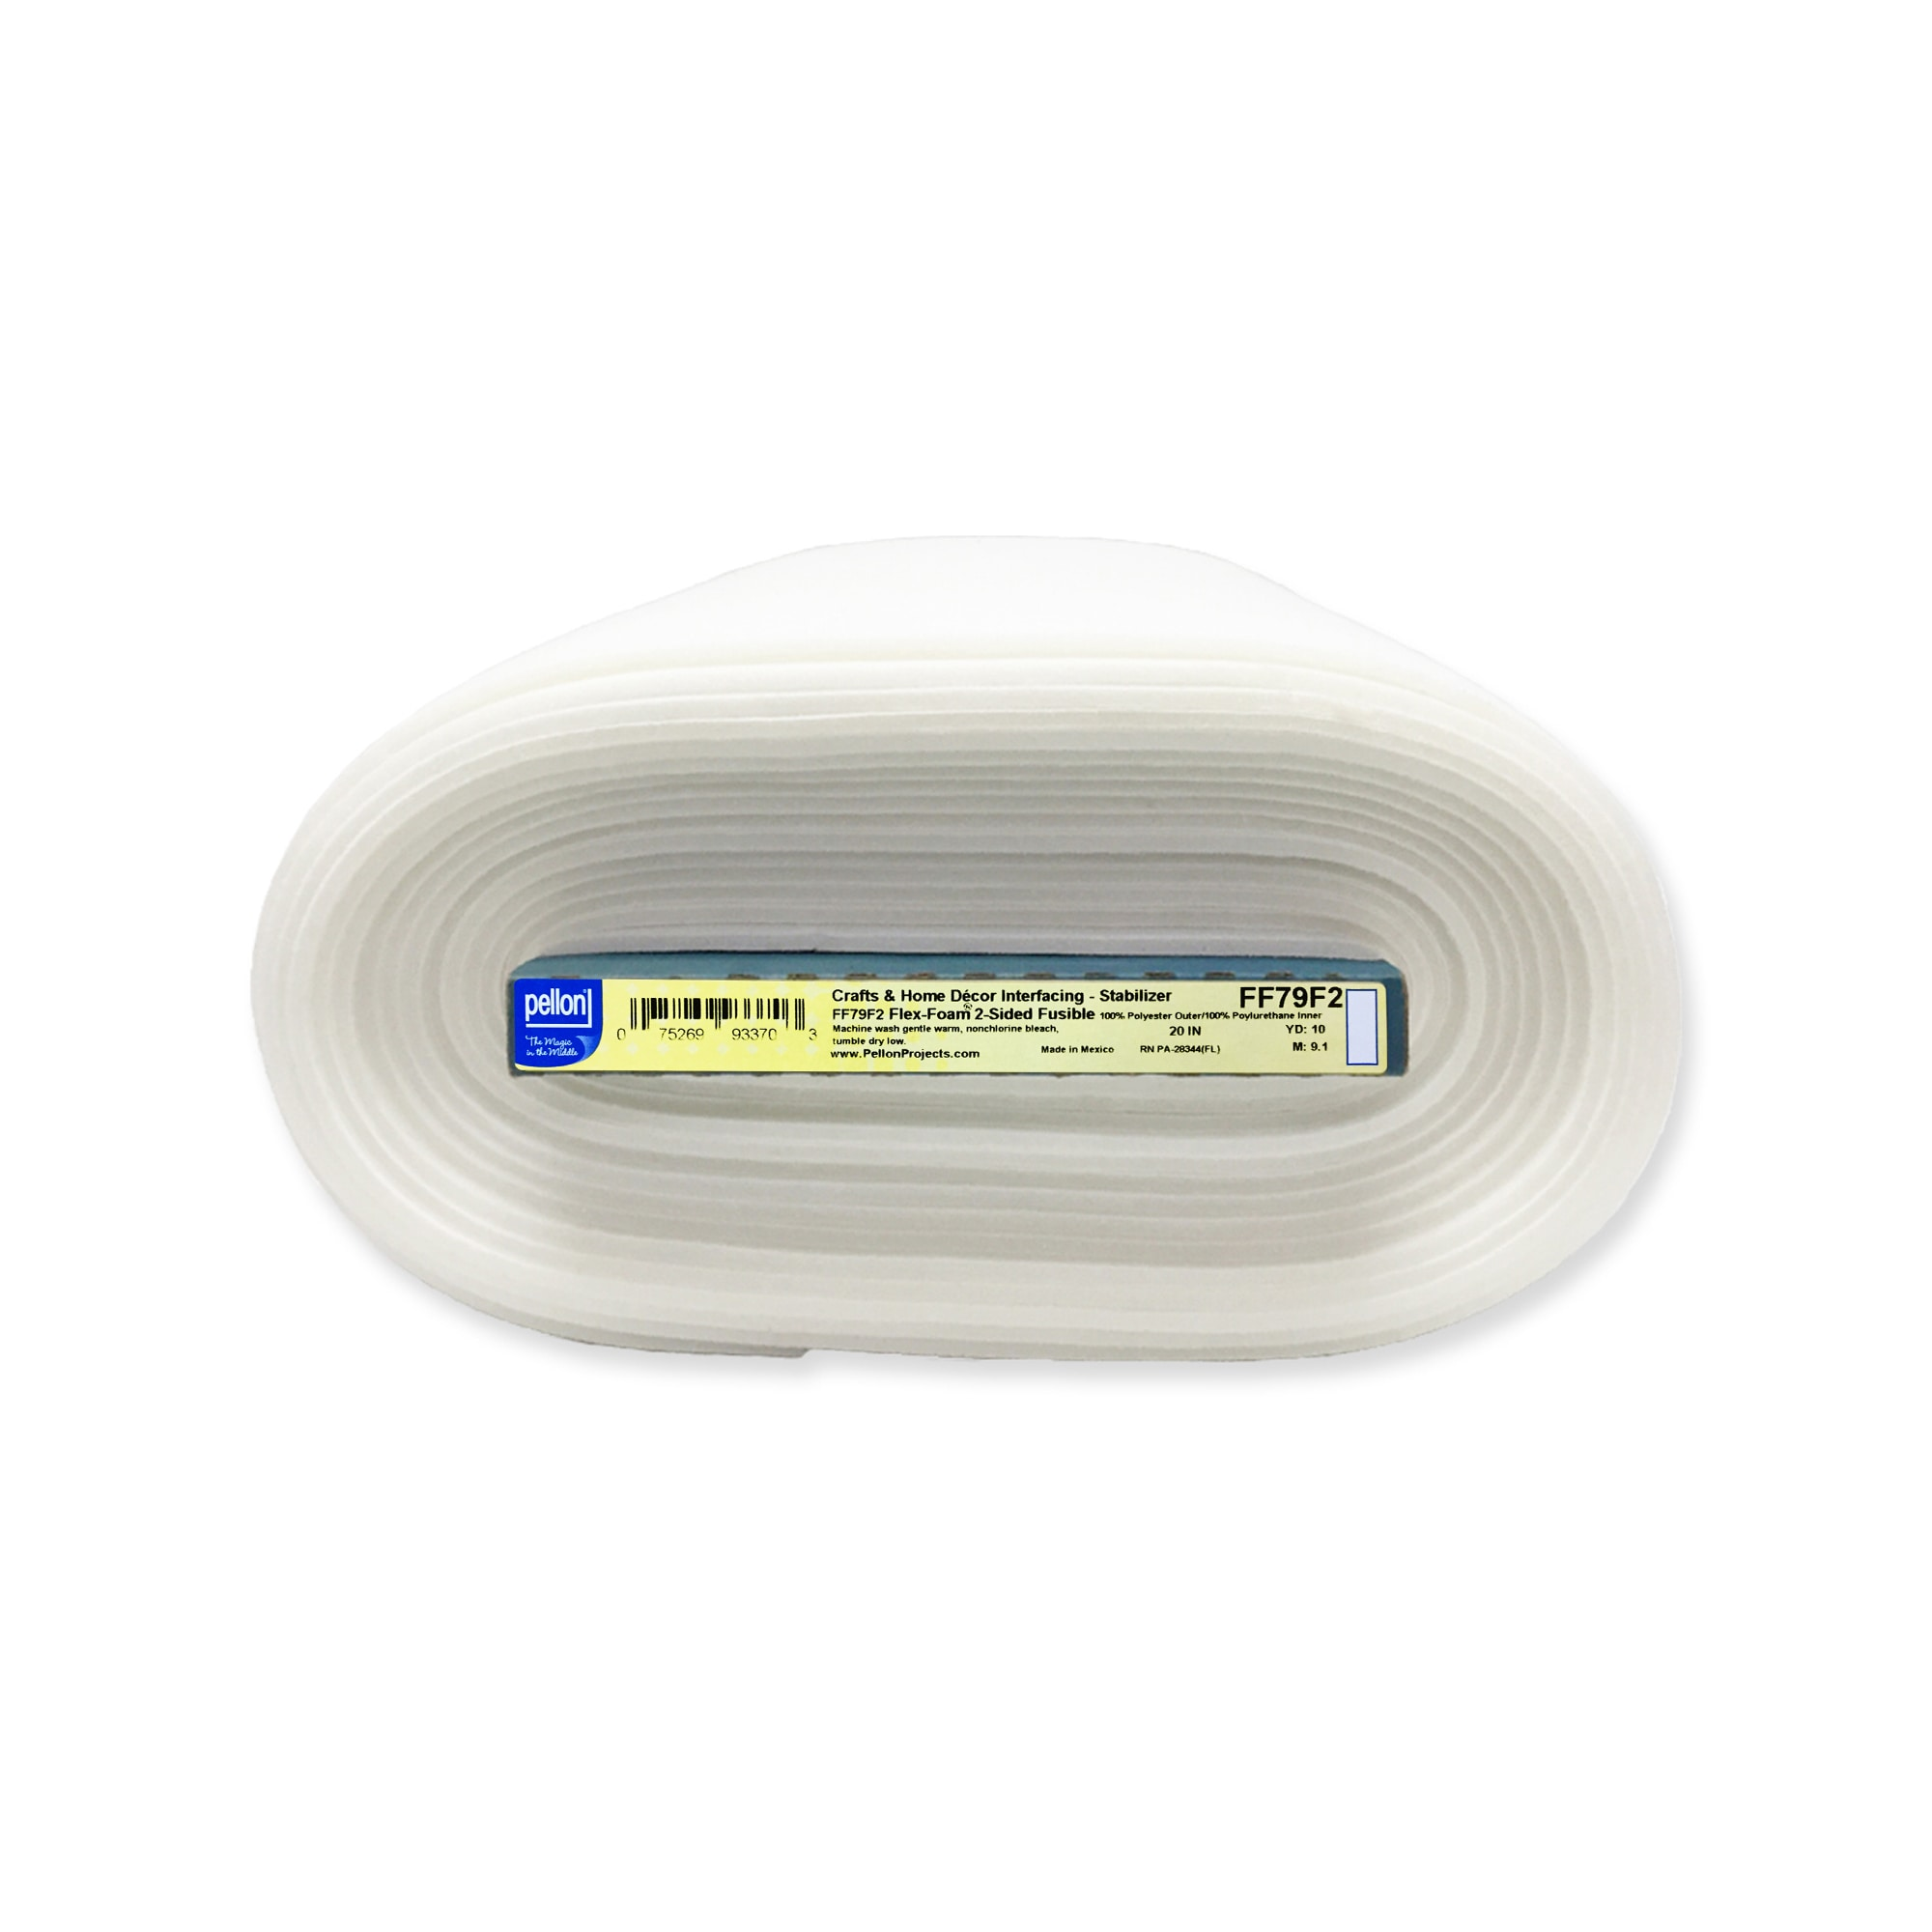 Pellon Flex Foam Fusible Ilizer On Free Shipping Orders Over 45 10560561